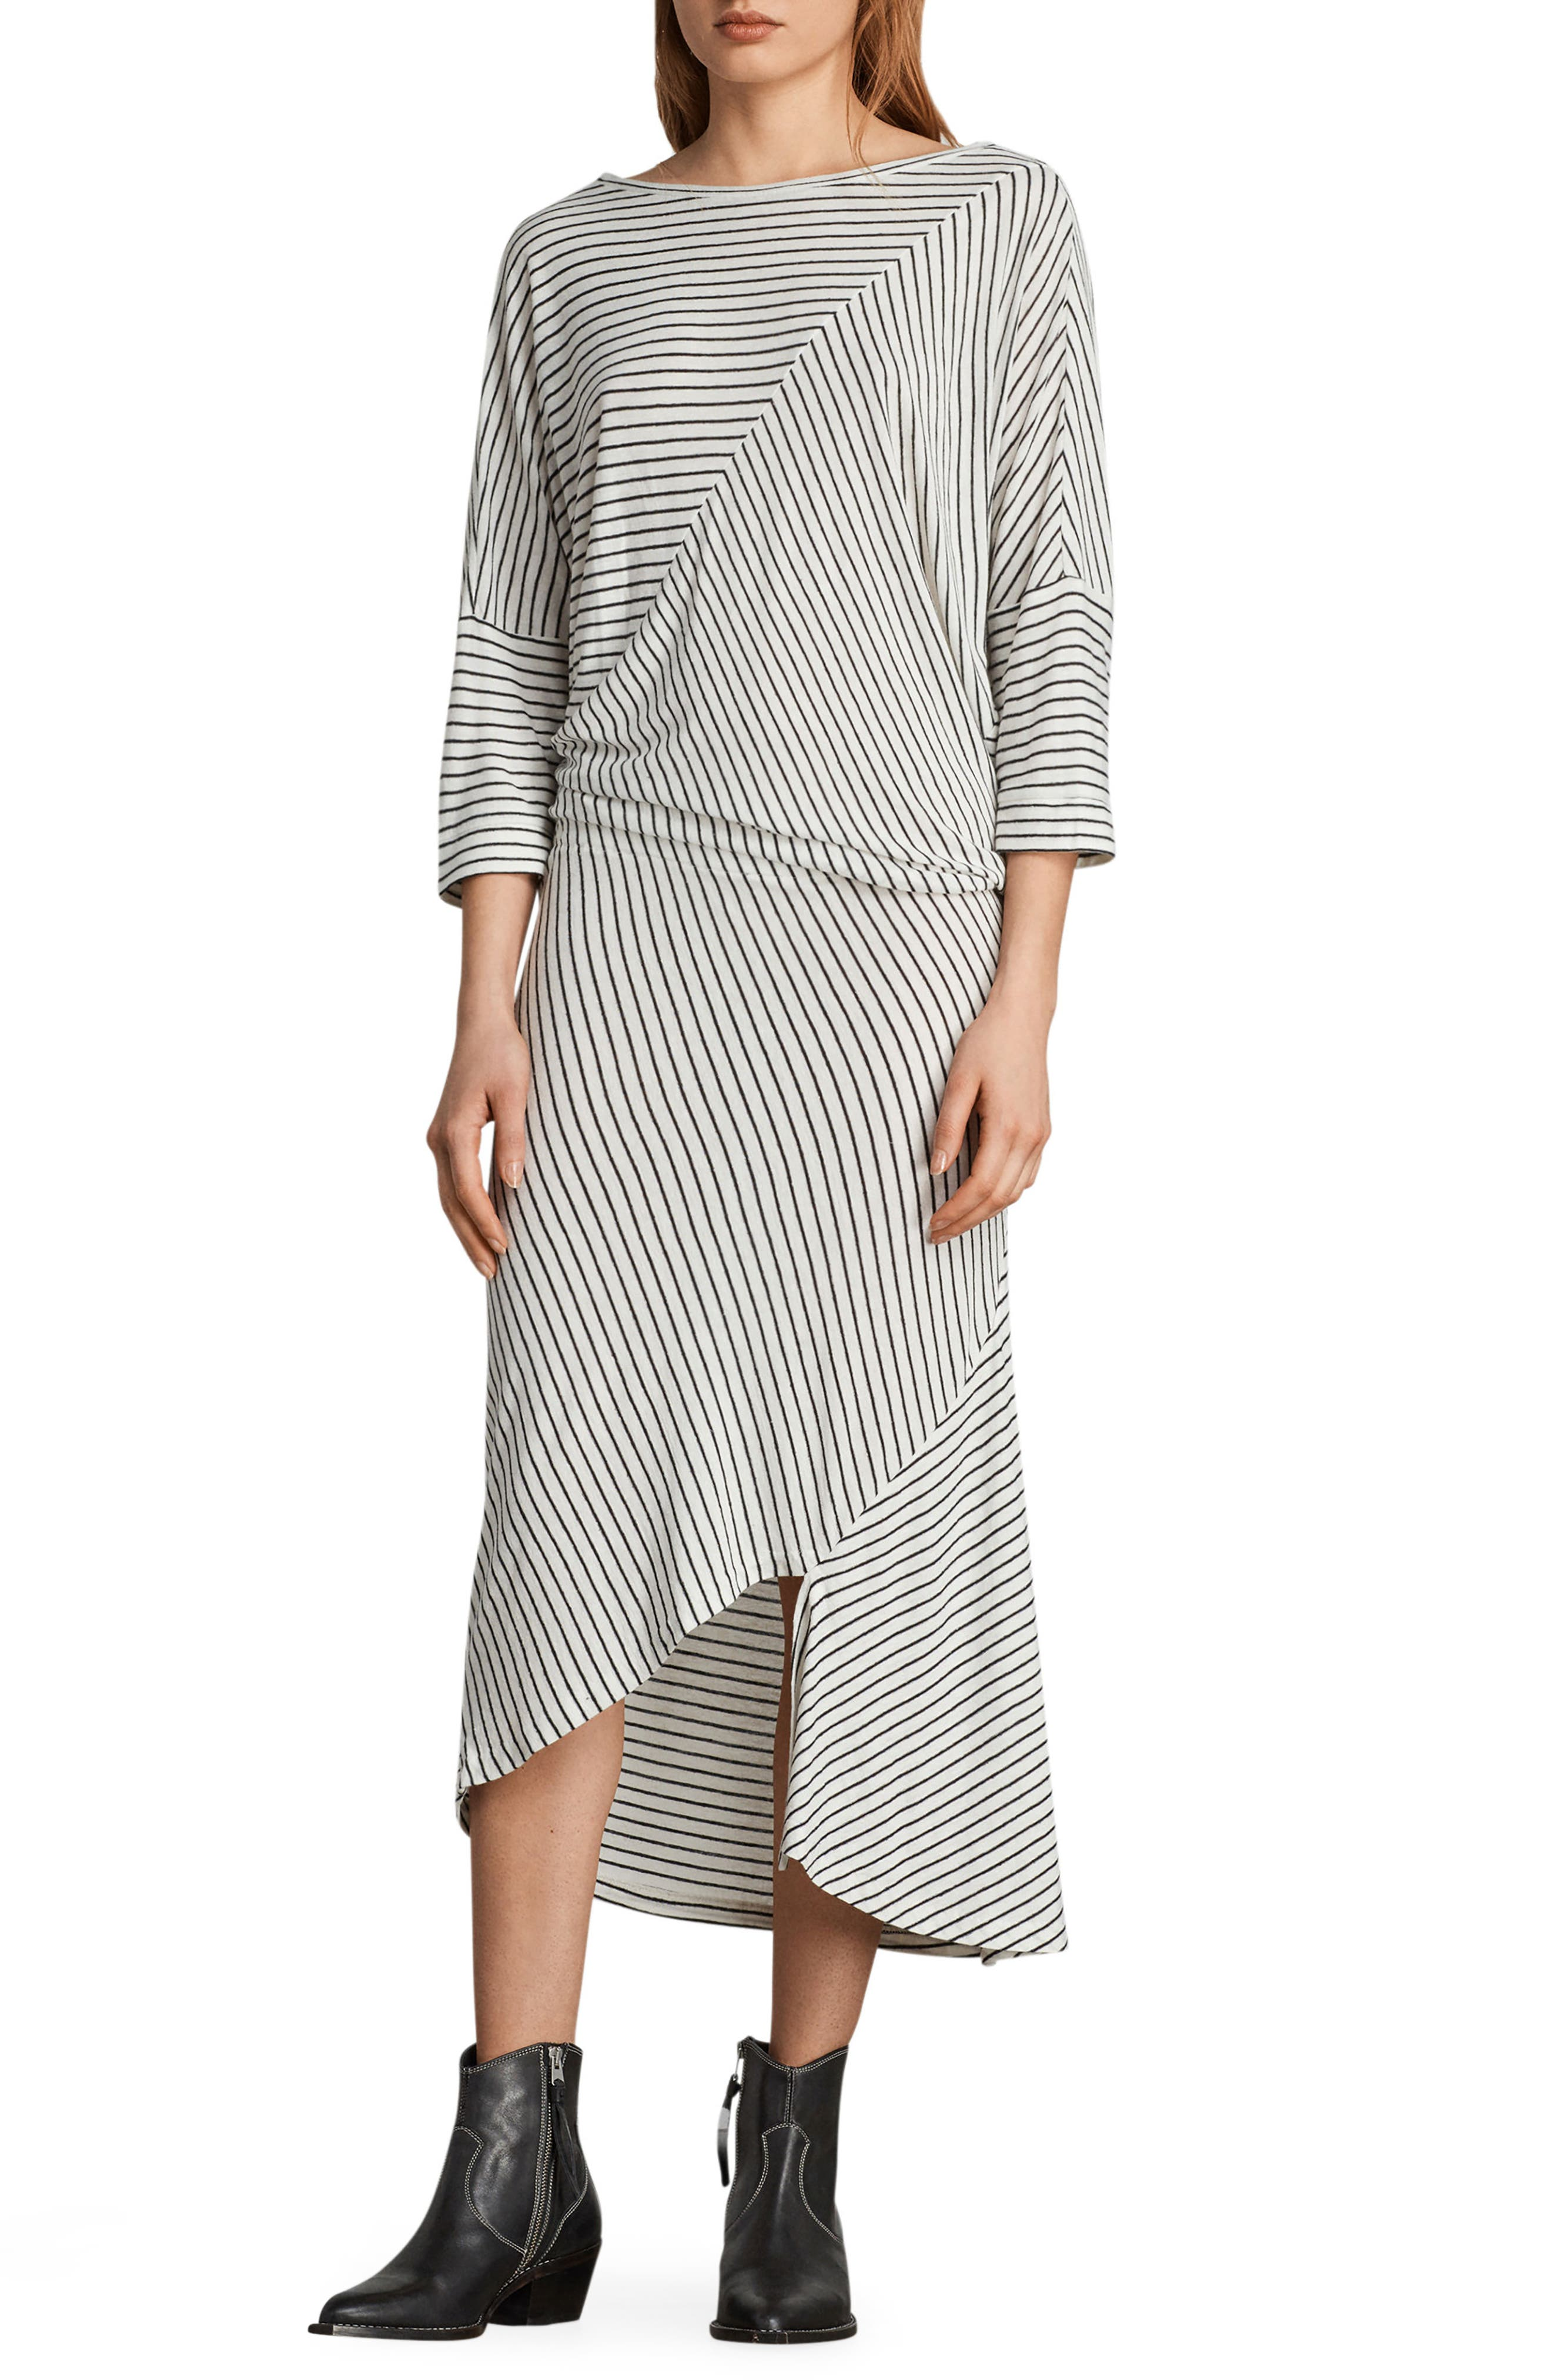 Cadie Stripe Midi Dress,                         Main,                         color, Ecru White/ Black